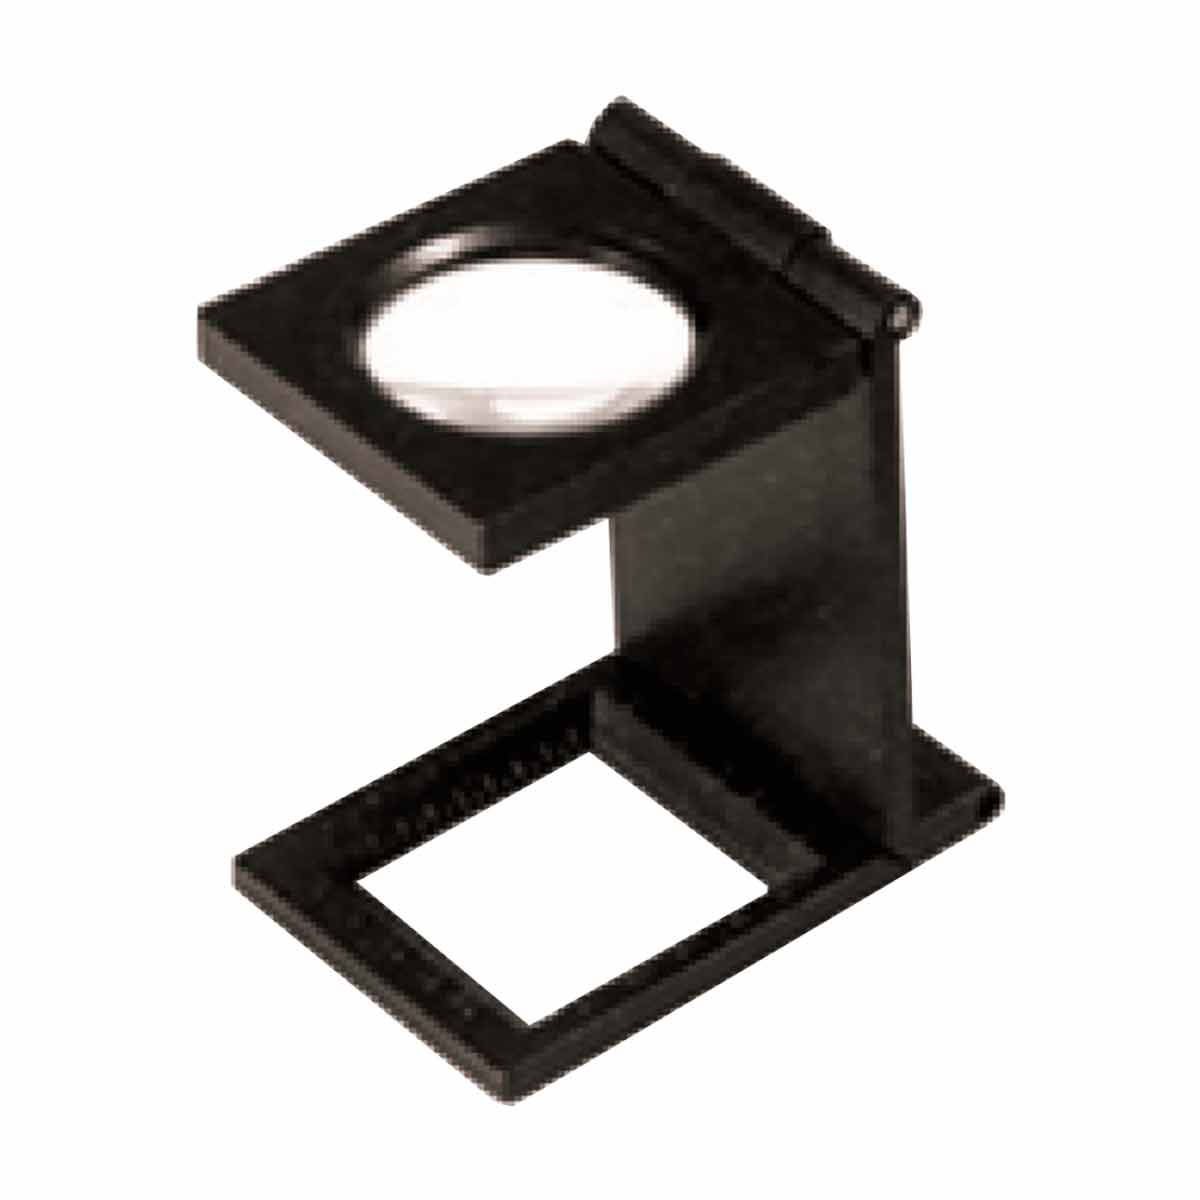 Lupa Conta Fios 24mm - 52939 CSR